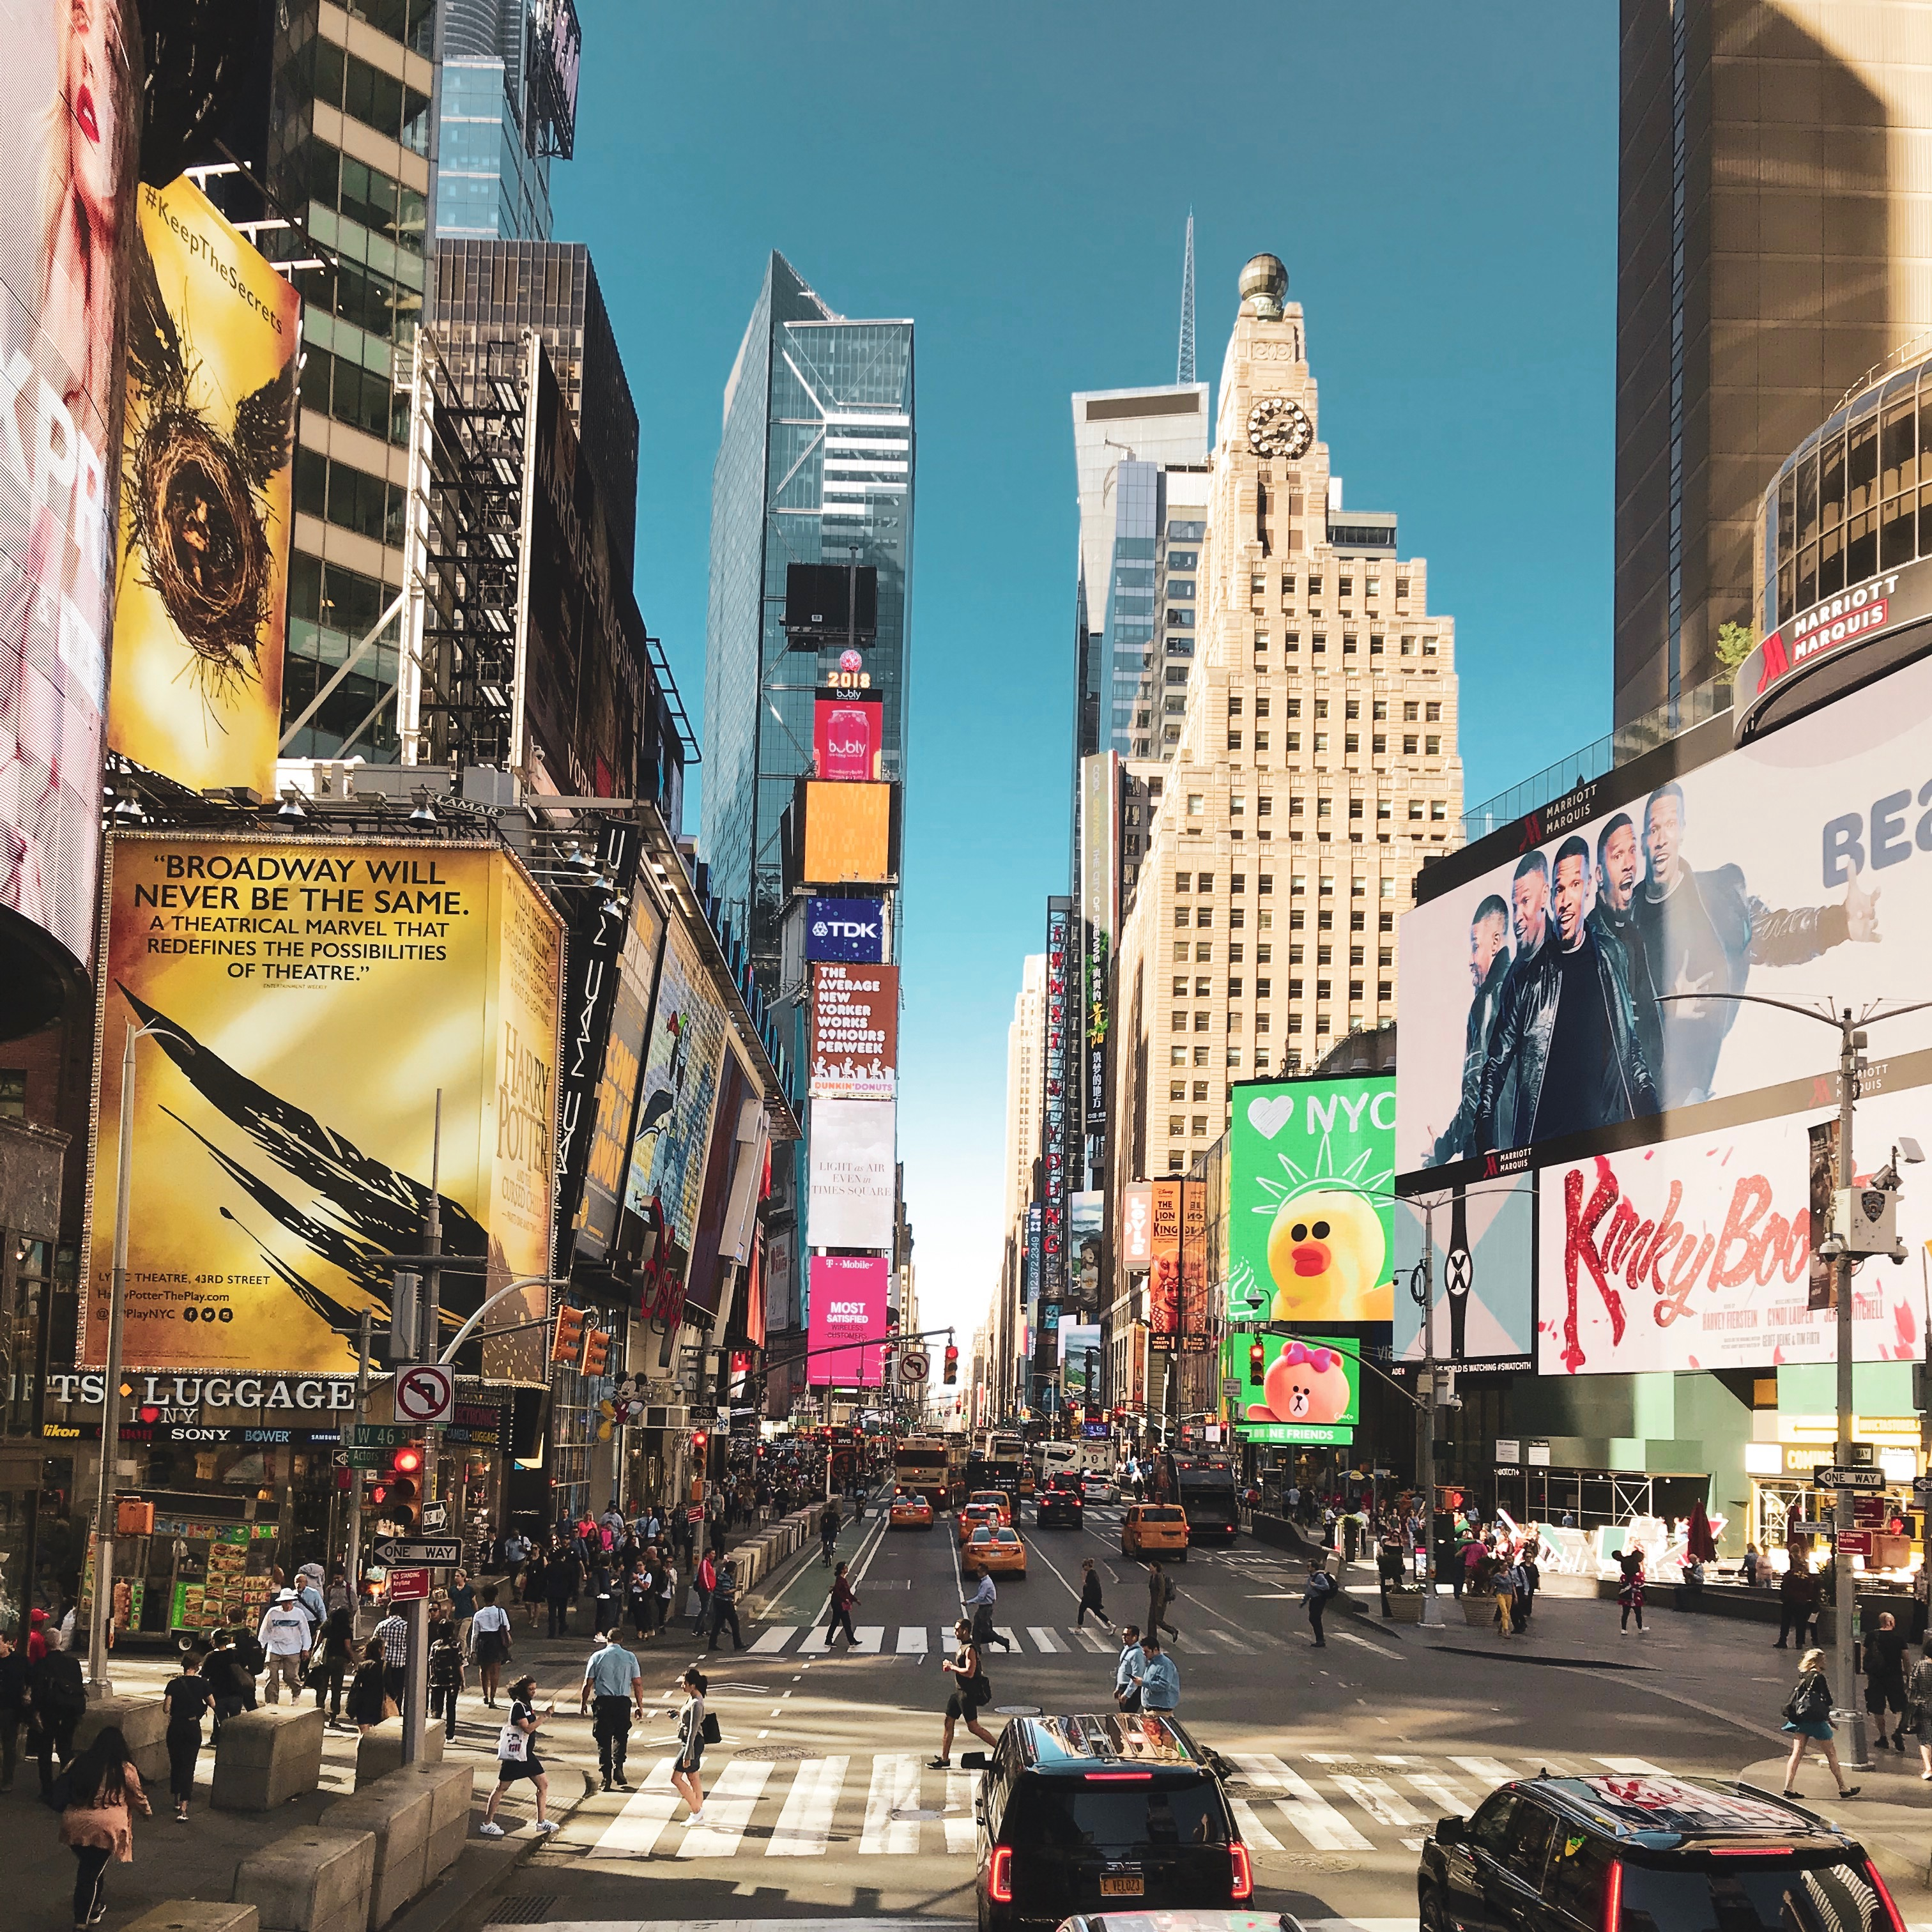 viaggio-a-new-york-manhattan-times-square